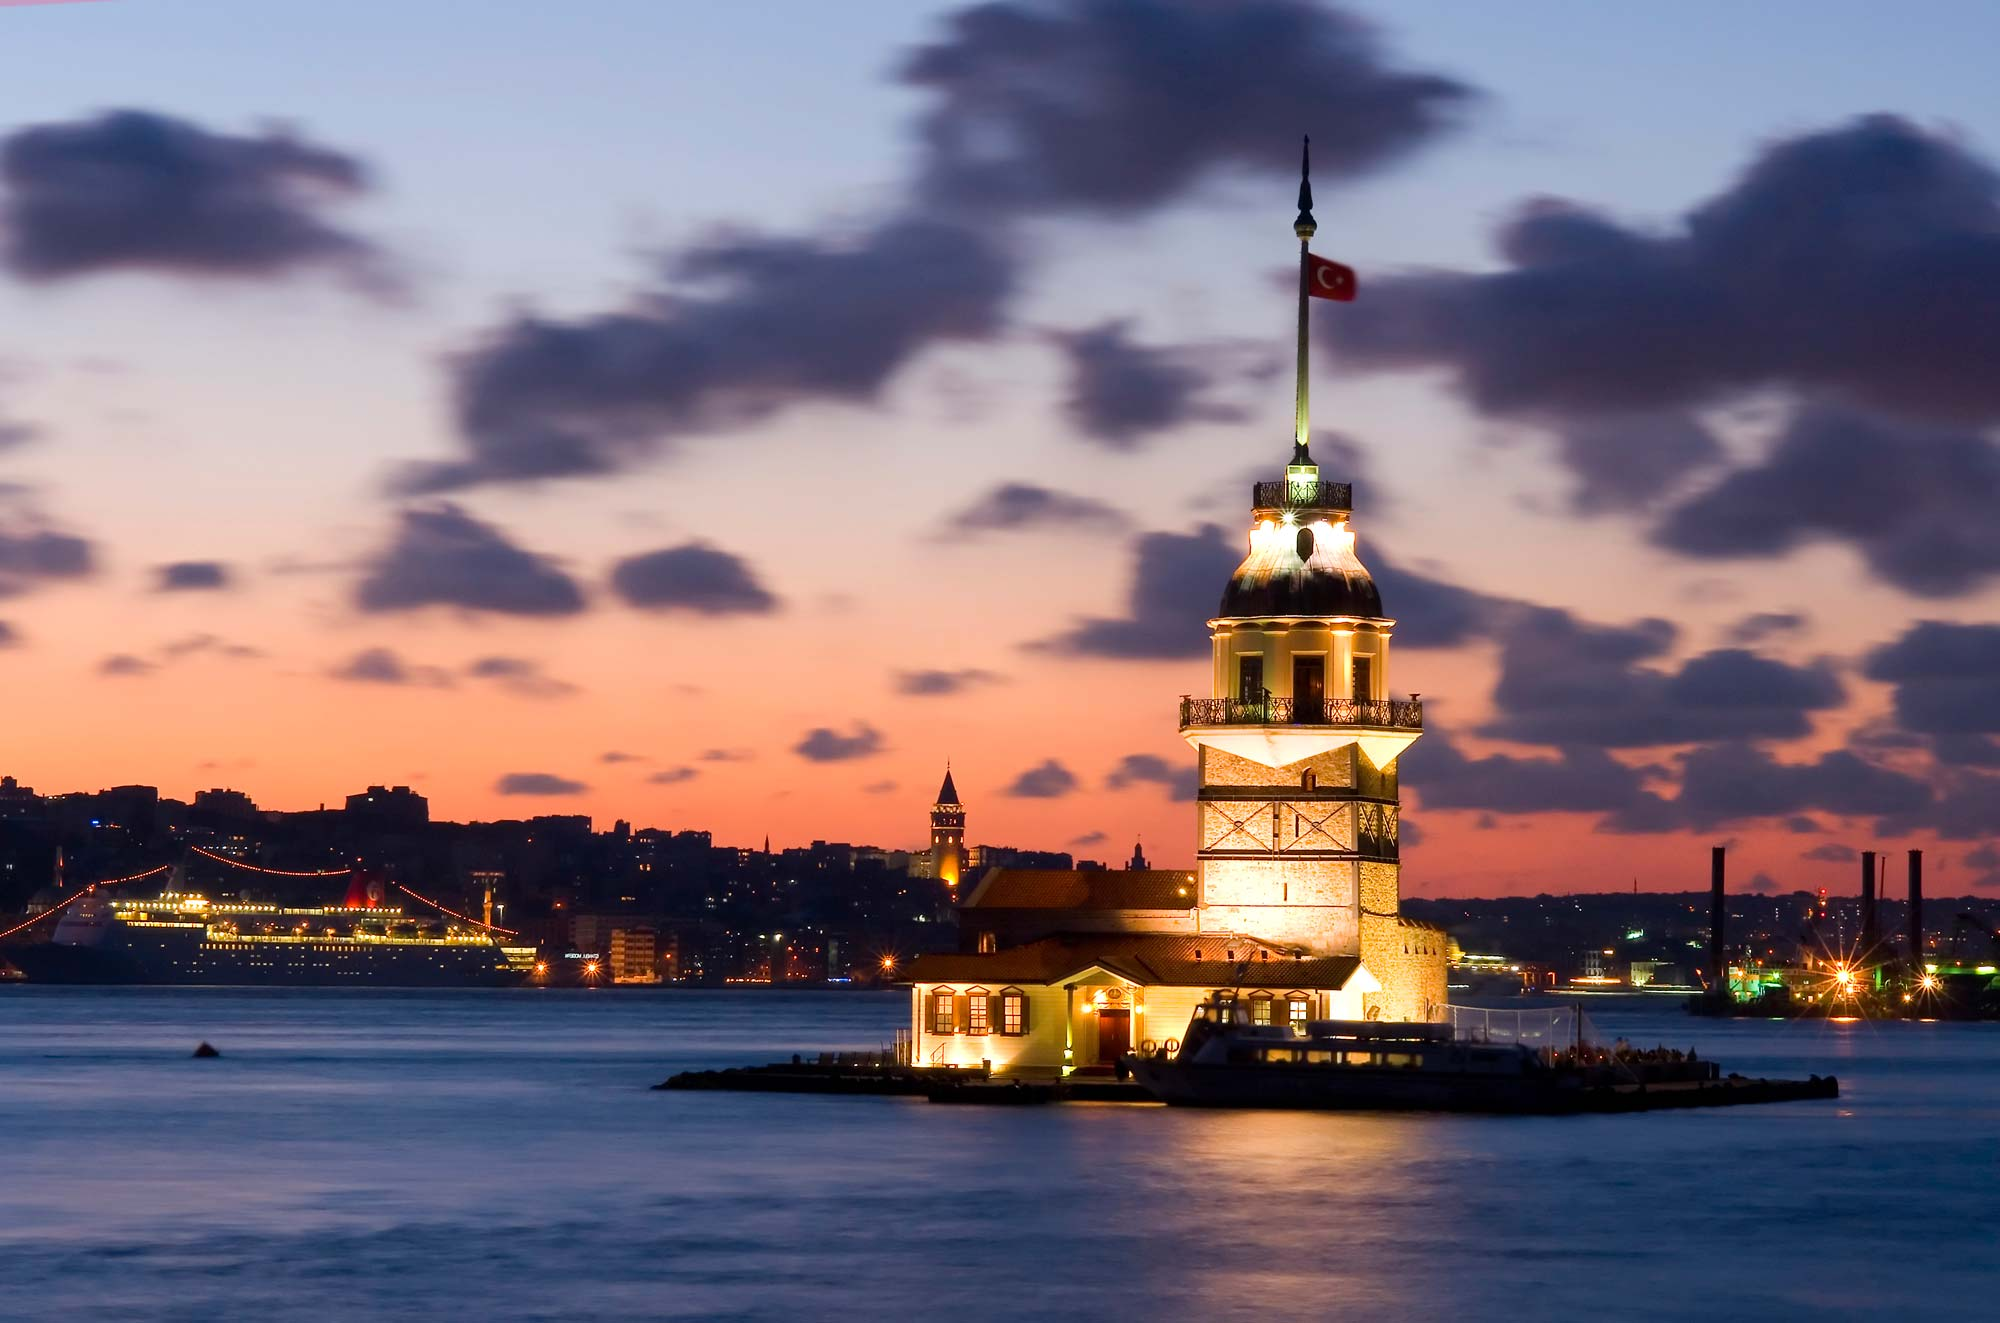 Istanbul City Wallpapers | Wide Screen Wallpaper 1080p,2K,4K